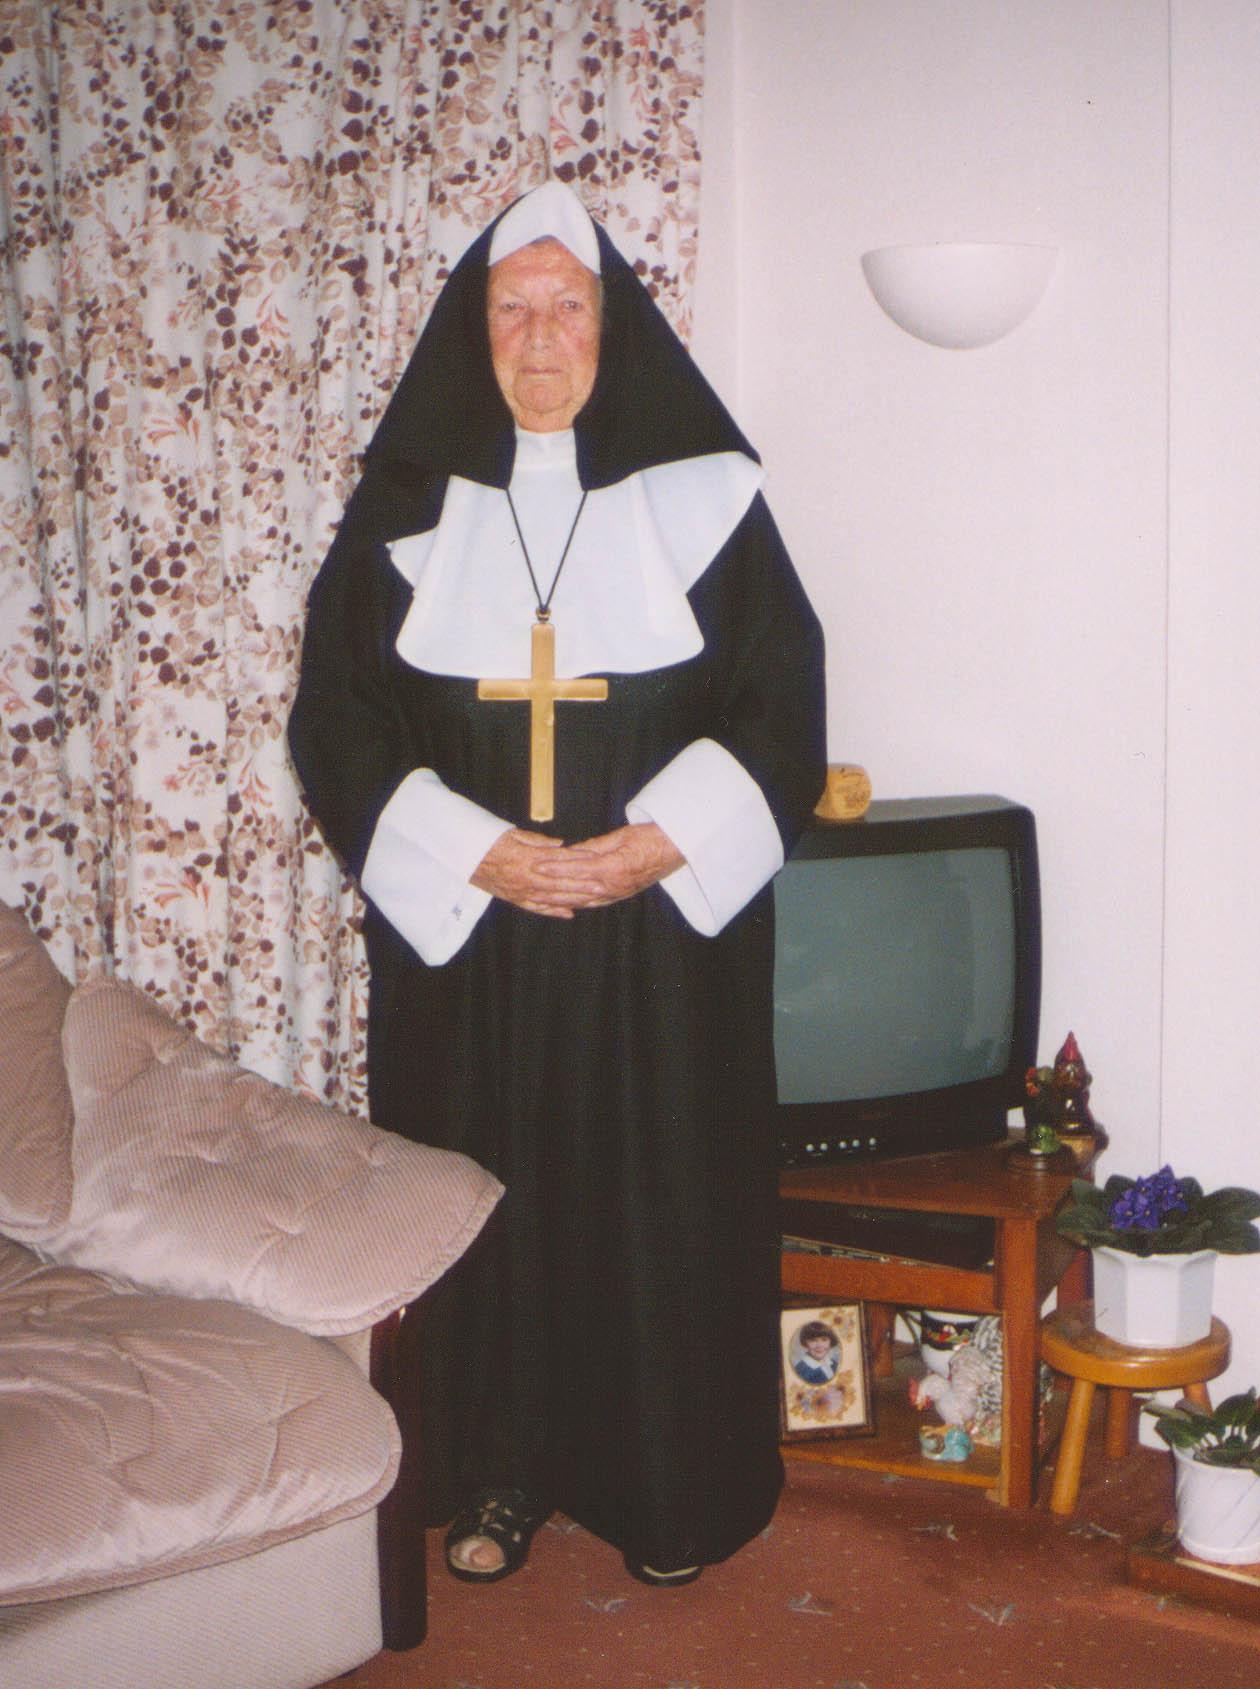 mum true vocation nov 2002